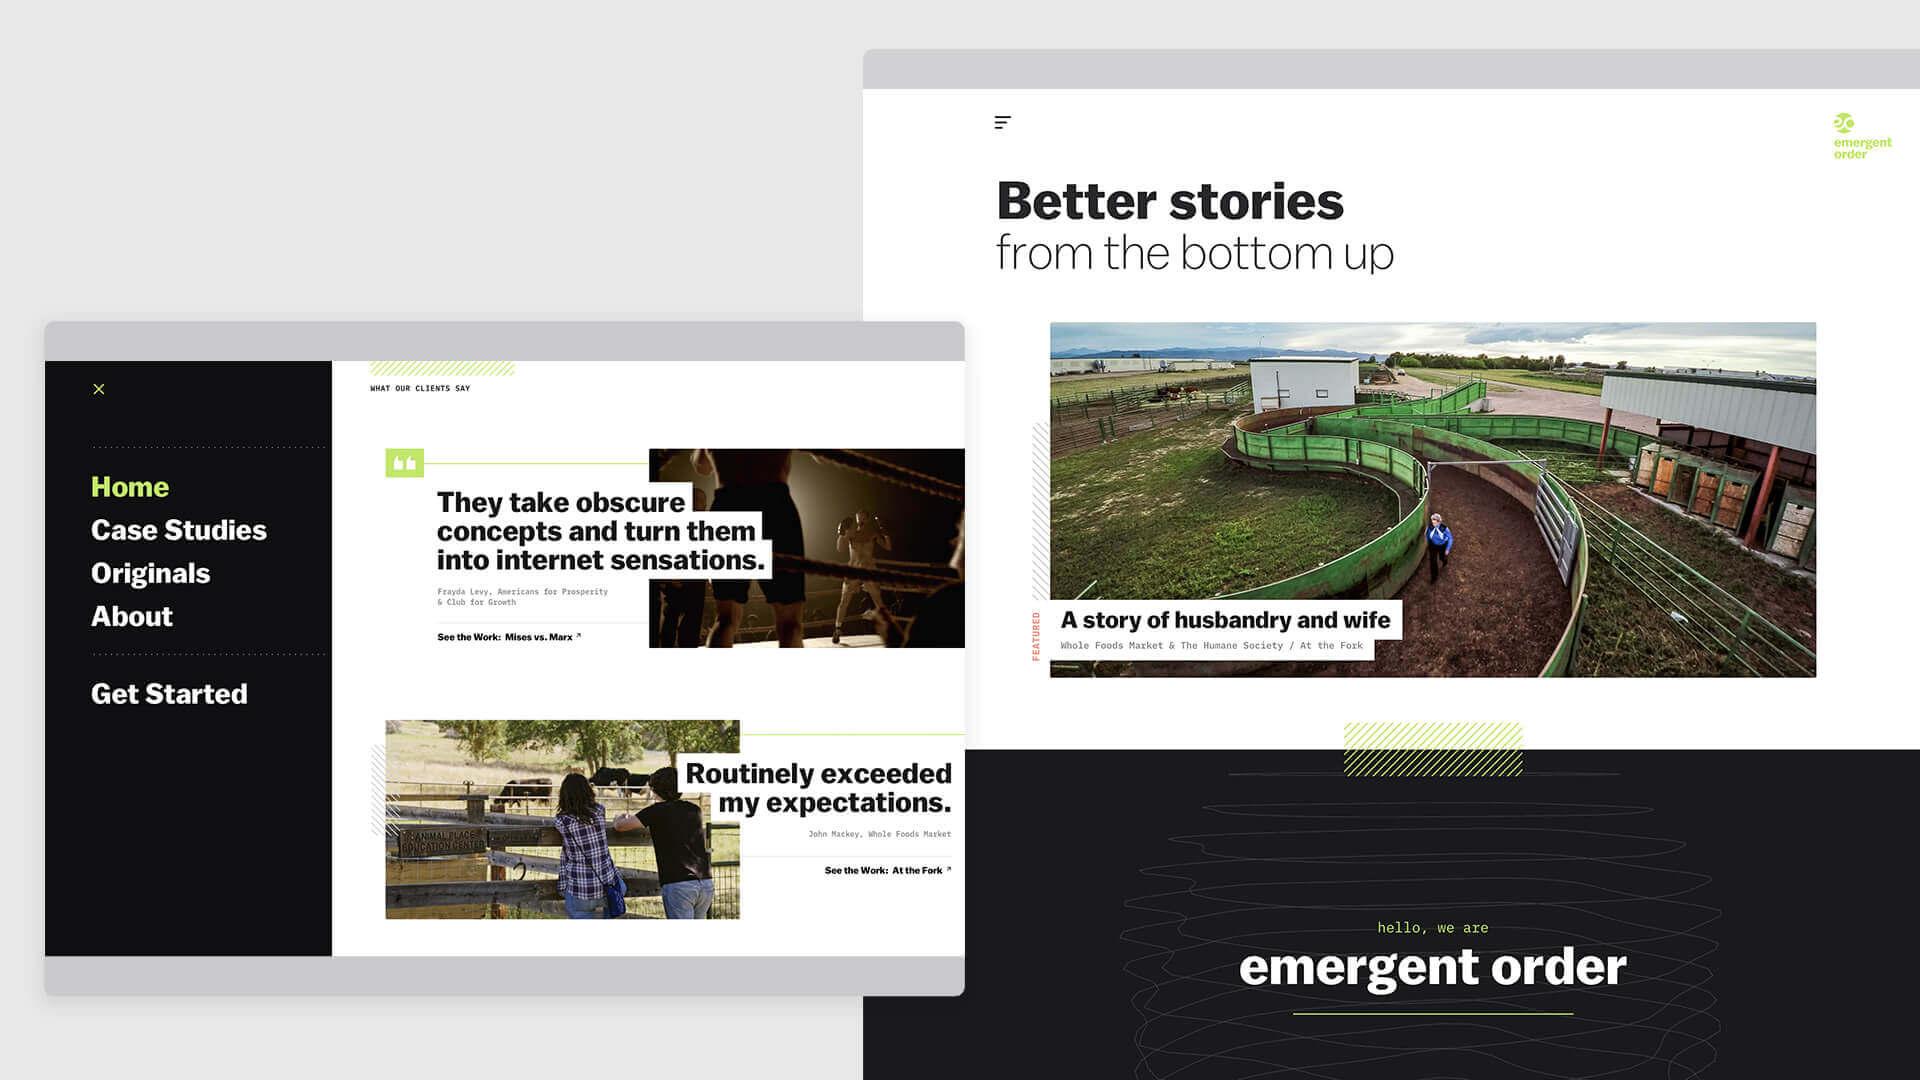 studio-malagon-emergent-order-website-homepage-light